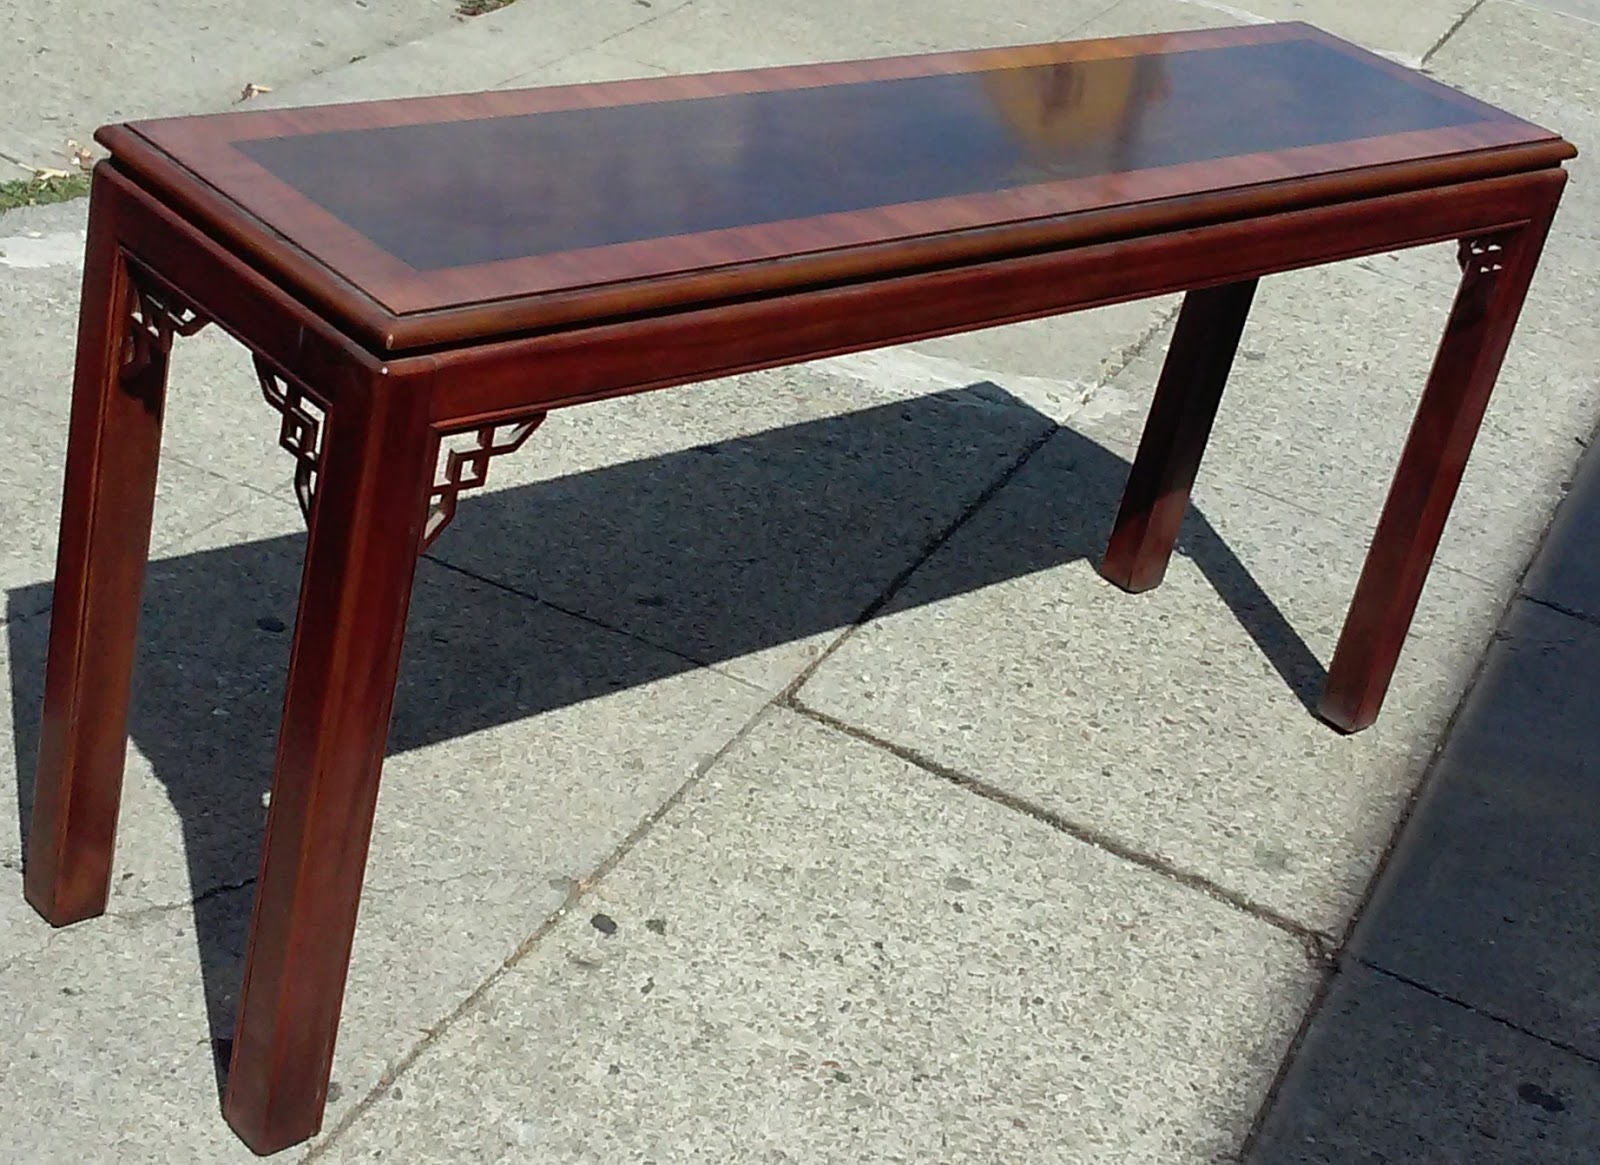 SOLD #5574 Drexel Vintage Modern Asian Sofa Table   $65